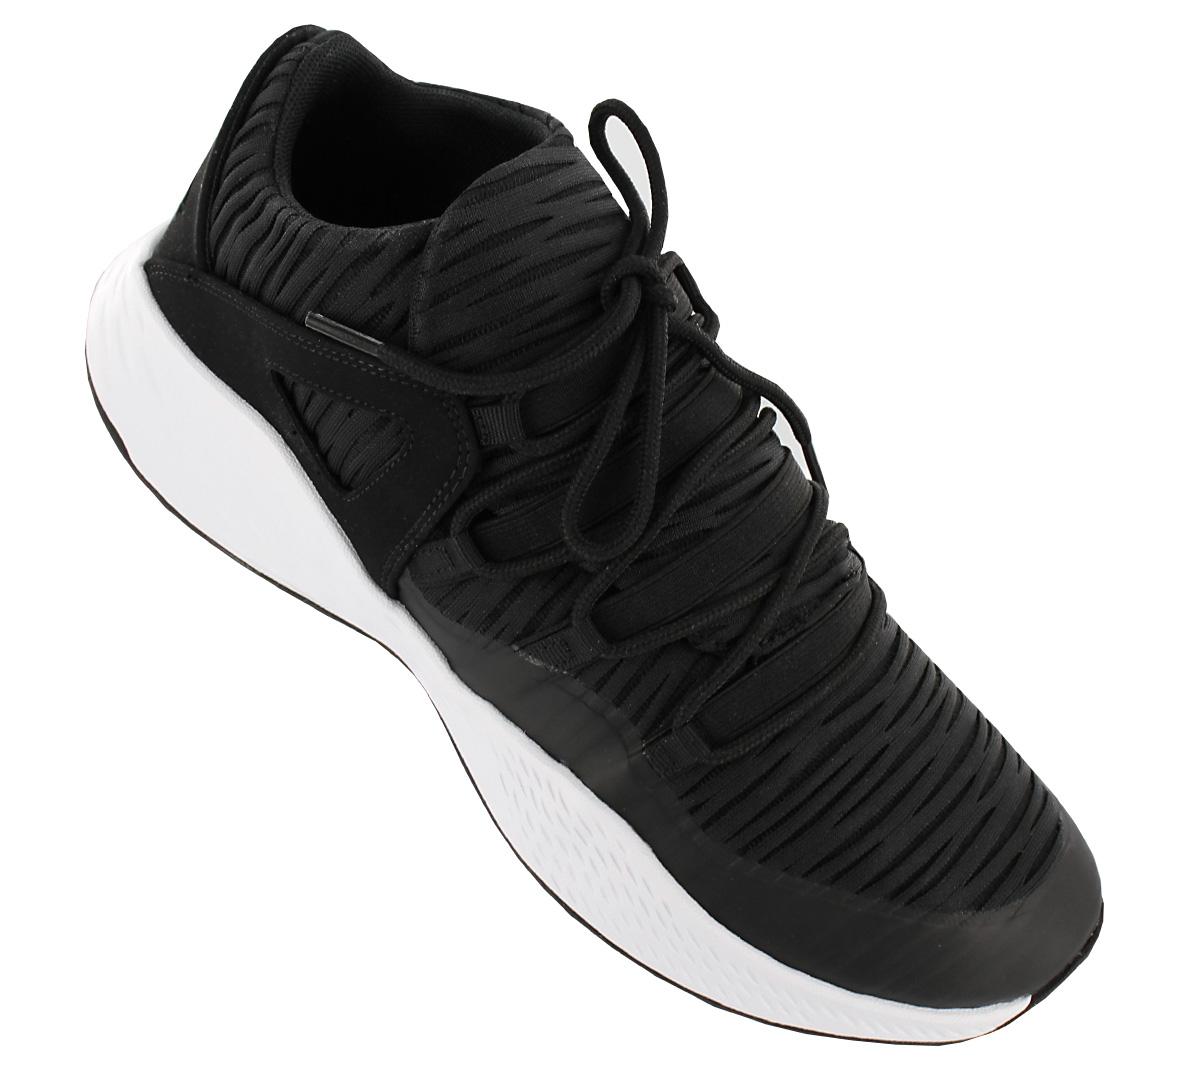 73fc5f6b3303 Nike Air Jordan Formula 23 Low Men s Trainers Shoes 919724 011 New ...